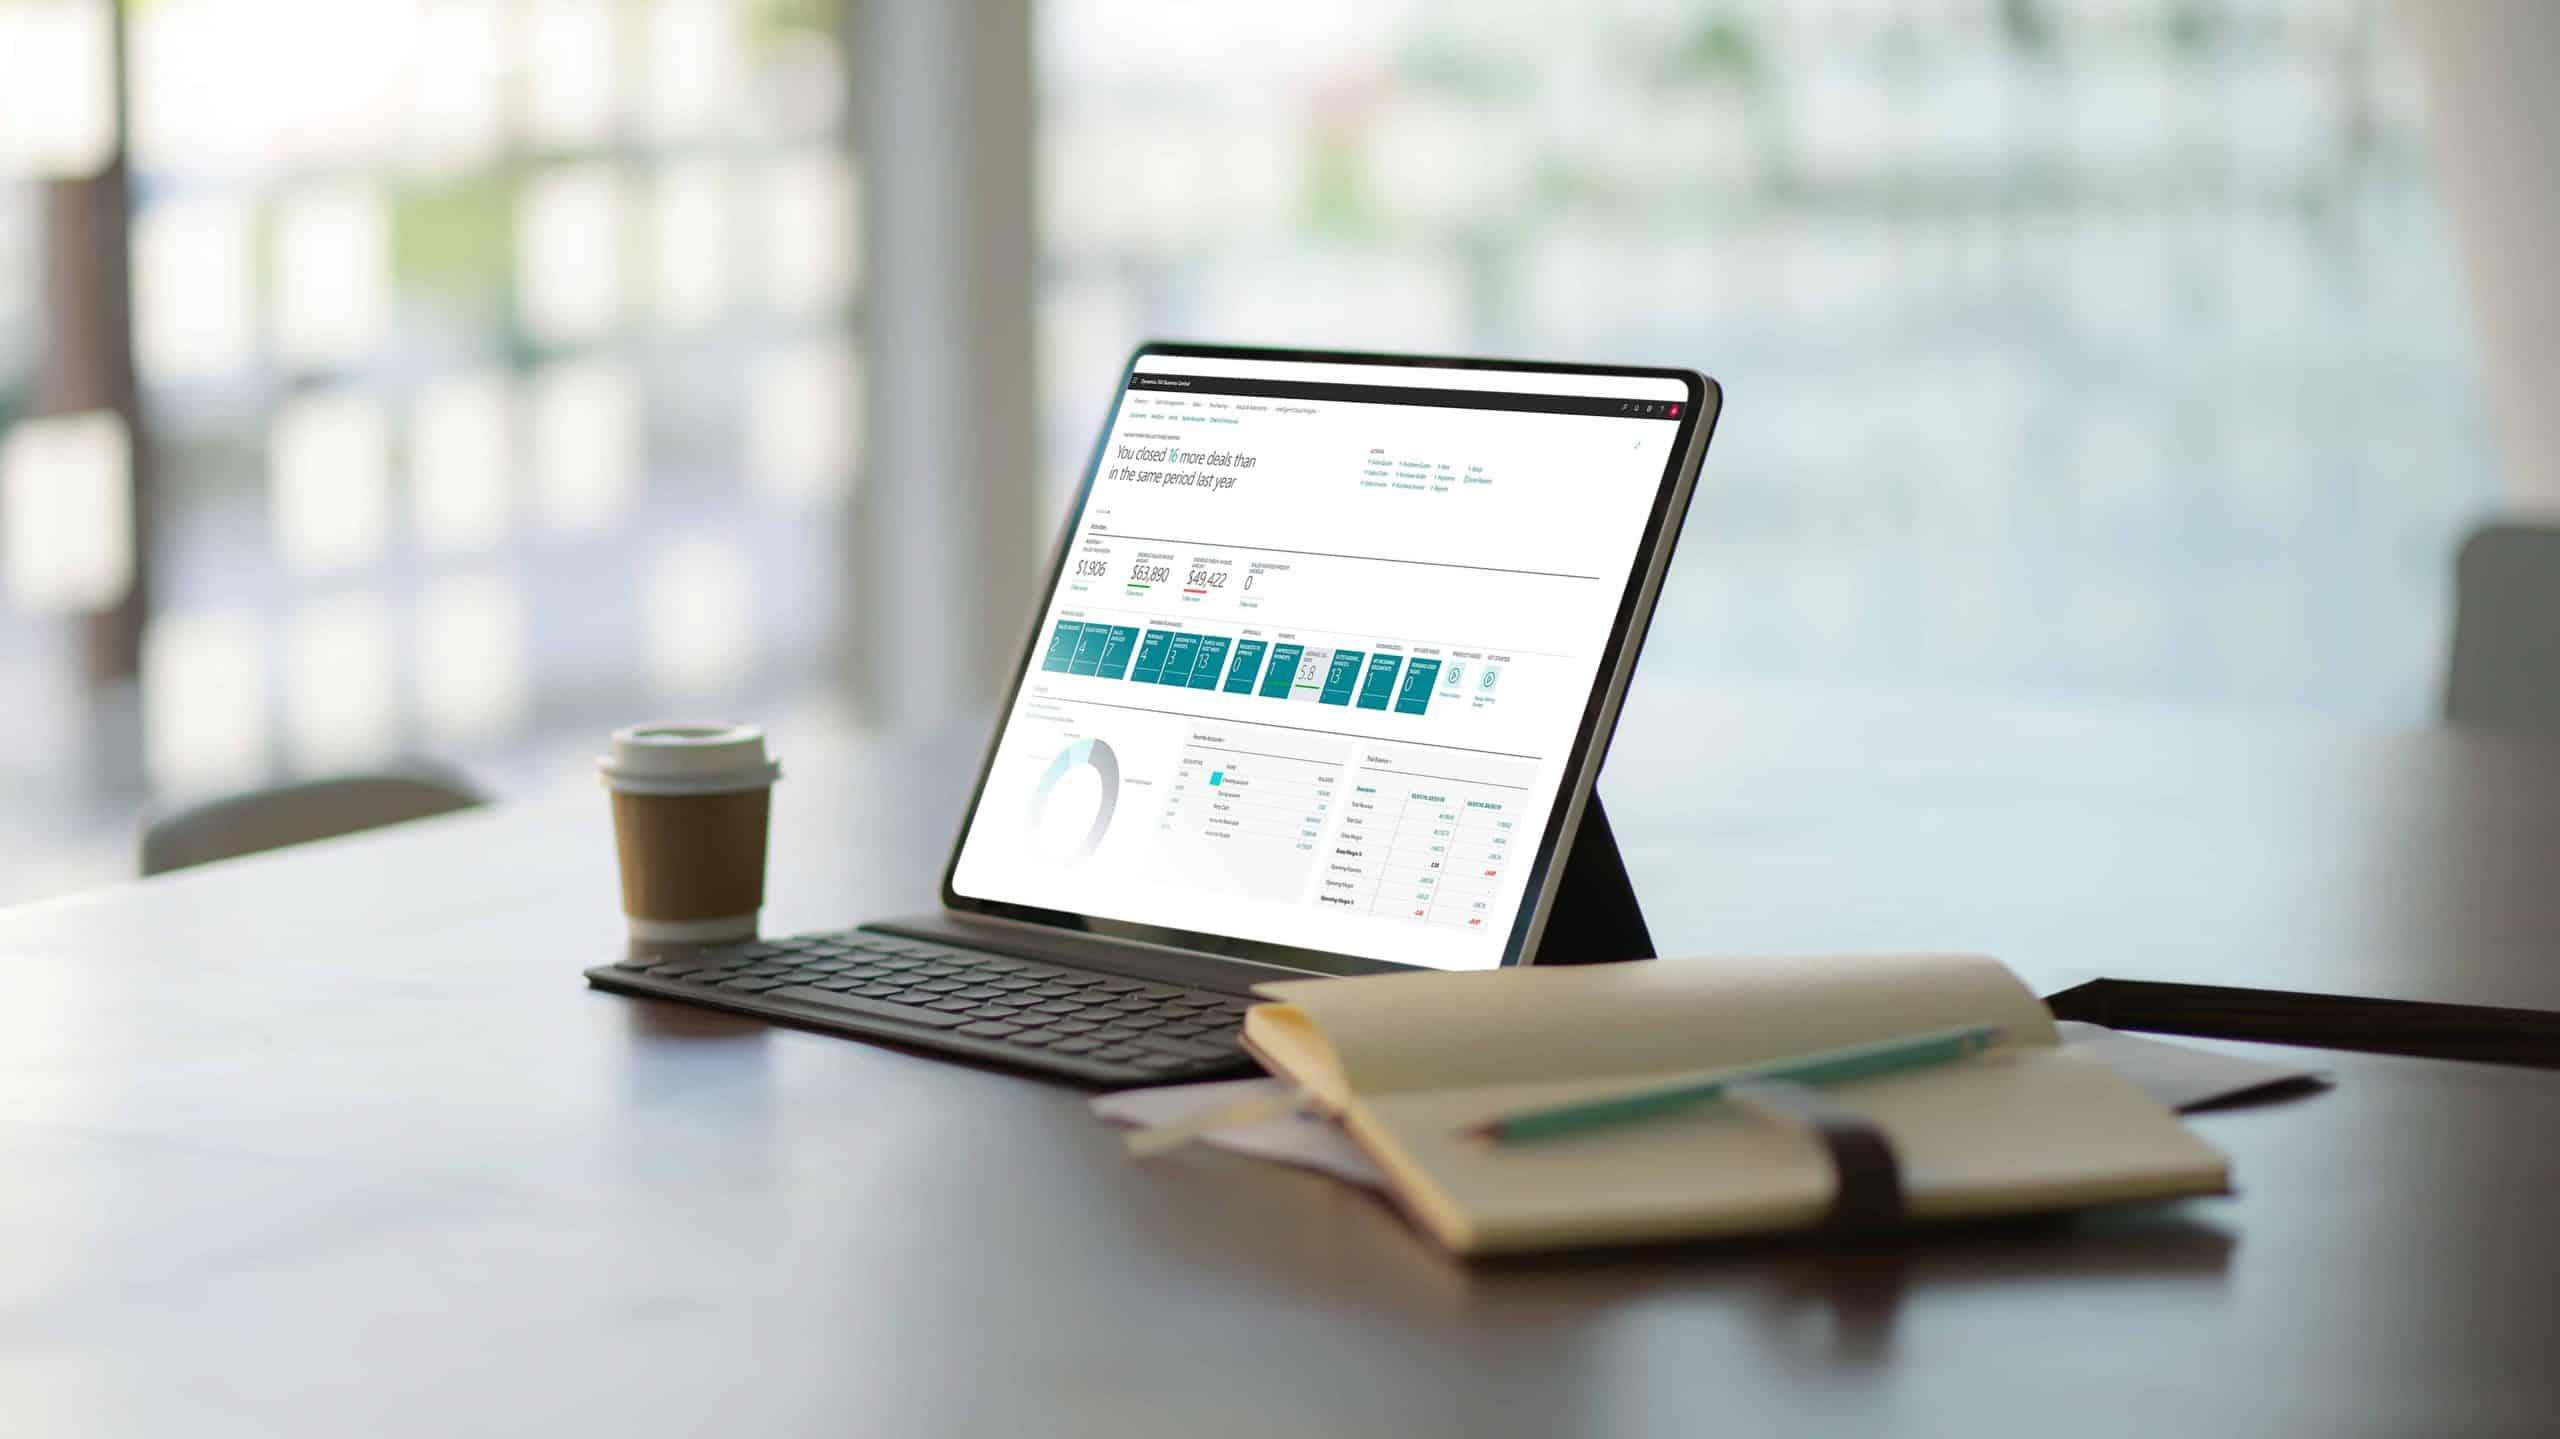 Microsoft Dynamics 365 Business Central Screenshot - tablet